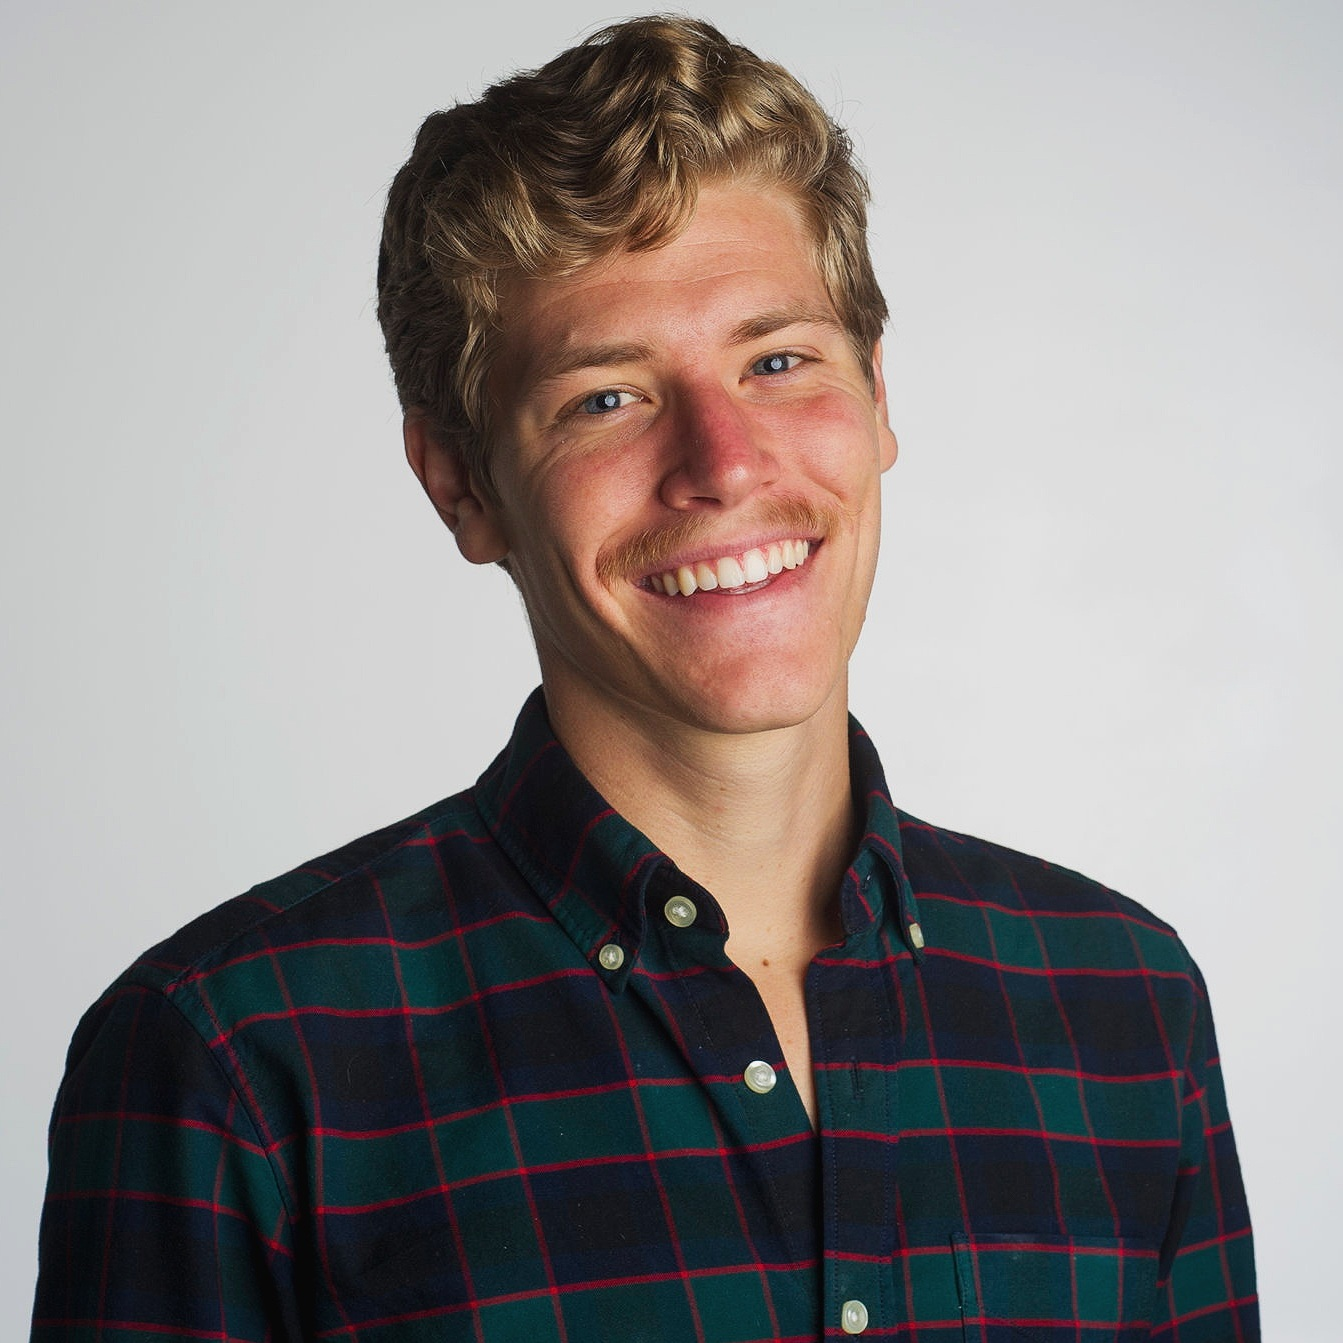 Justin earned his BA in Photojournalism at WKU